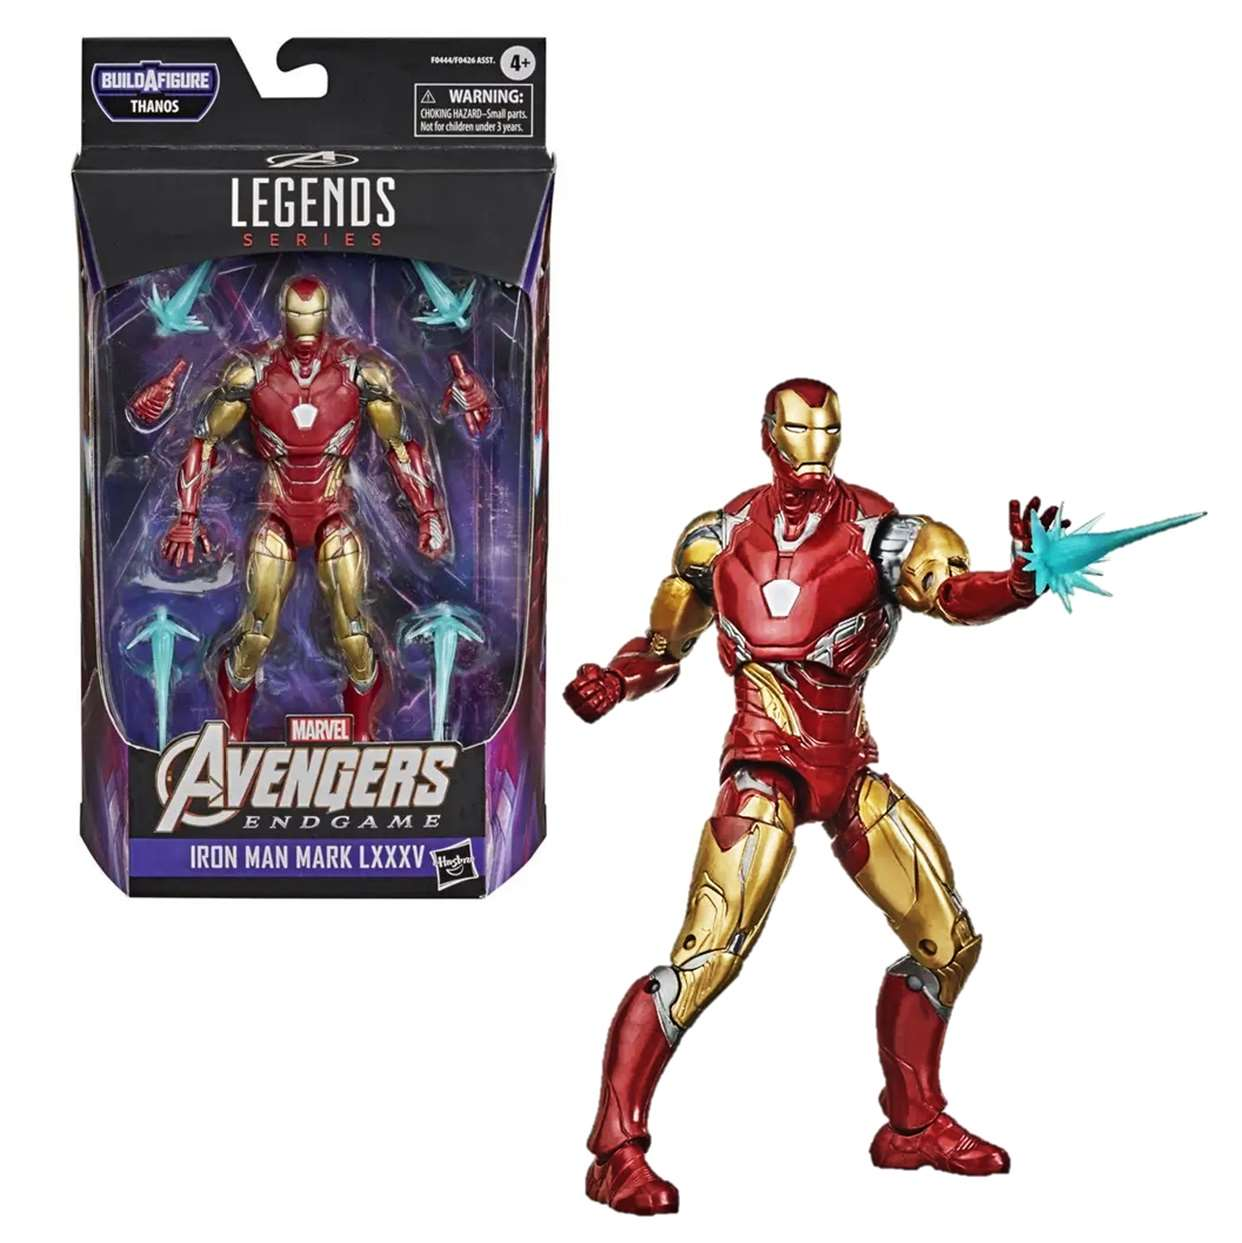 Iron Man Mark Lxxxv Avengers End Game B A F Thanos Legends